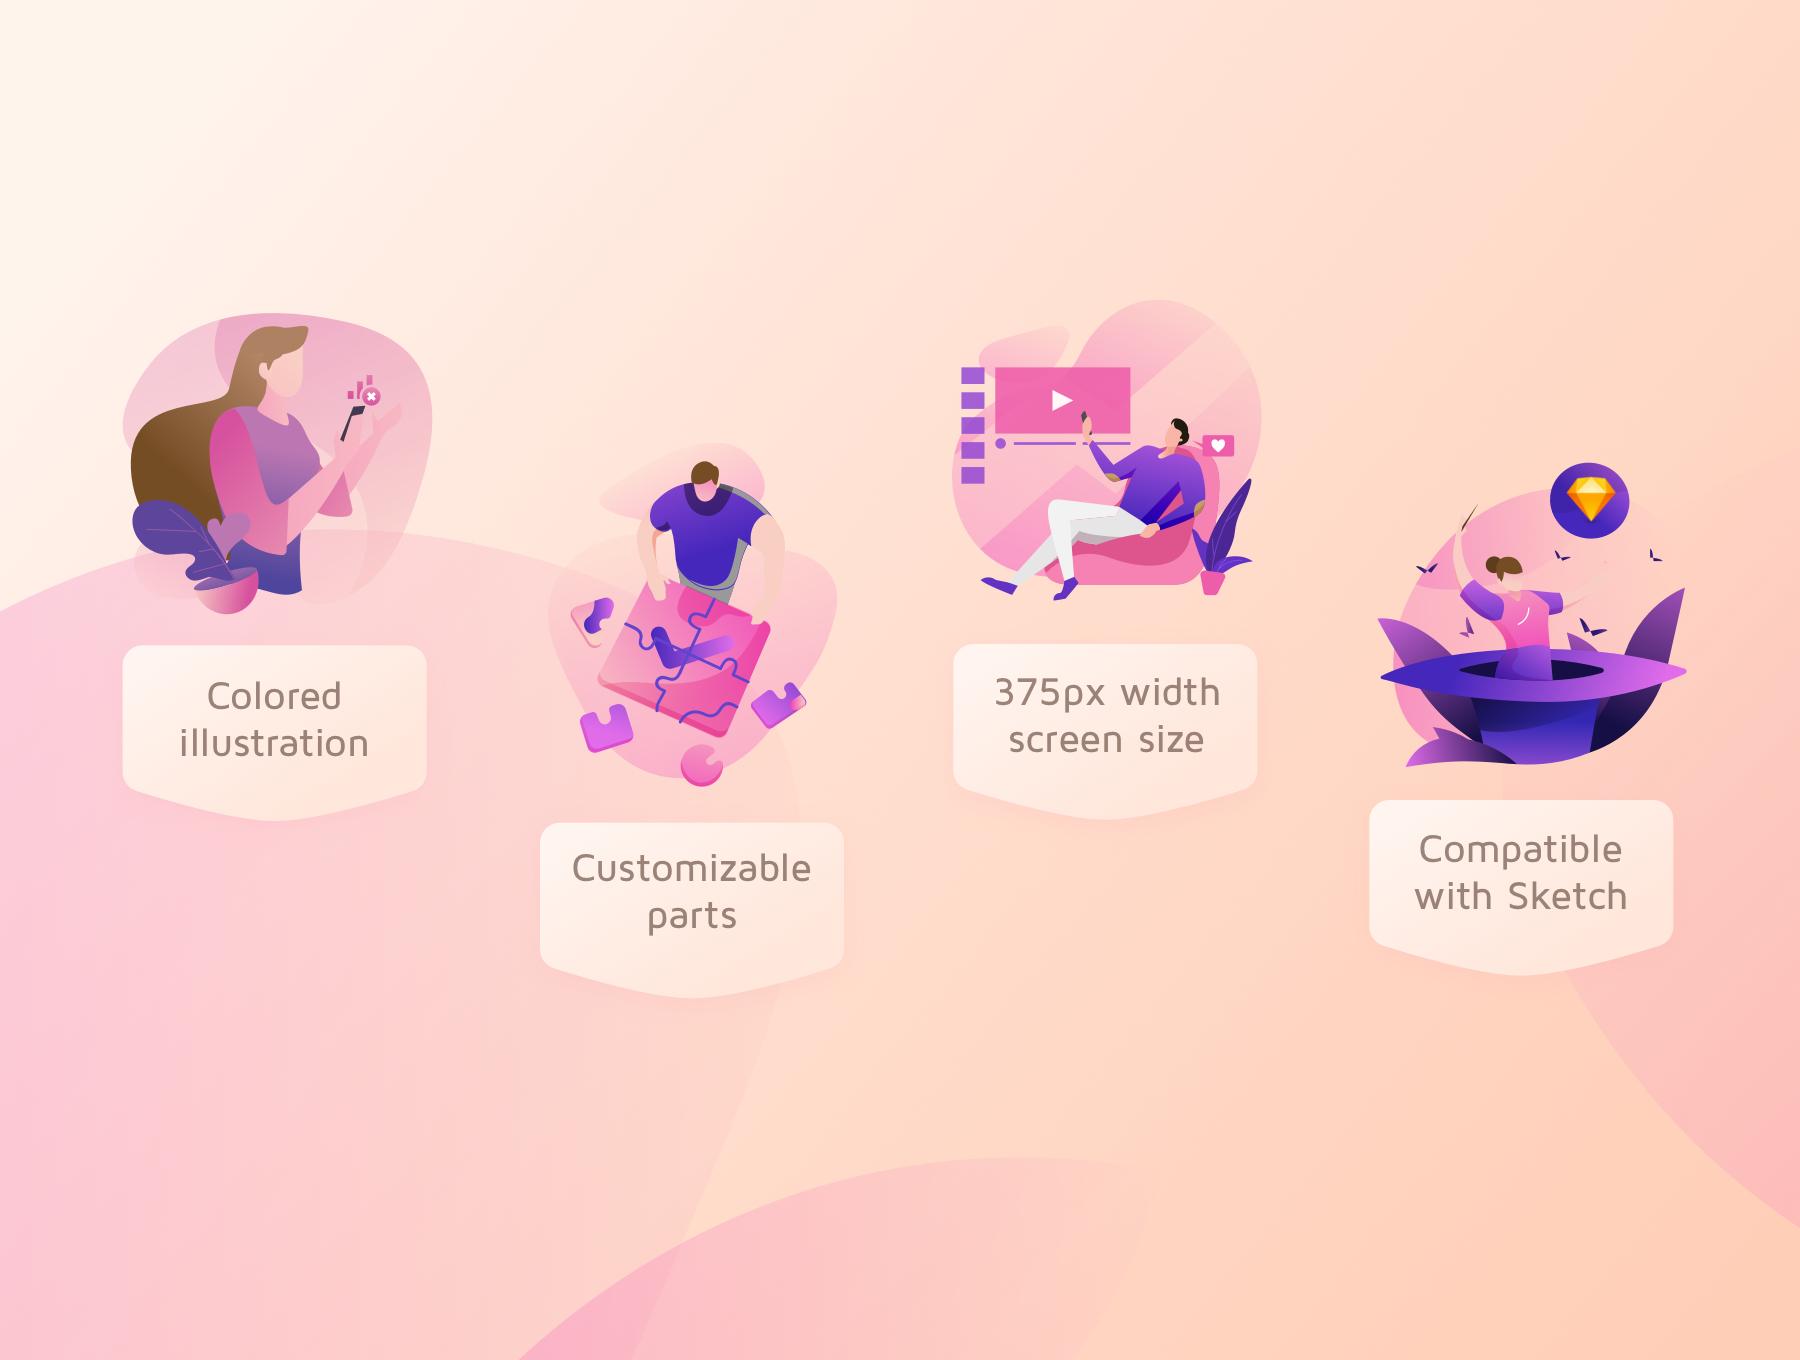 现代精美视频平台APP设计矢量插画素材包 Laras Video Illustration Pack插图(5)